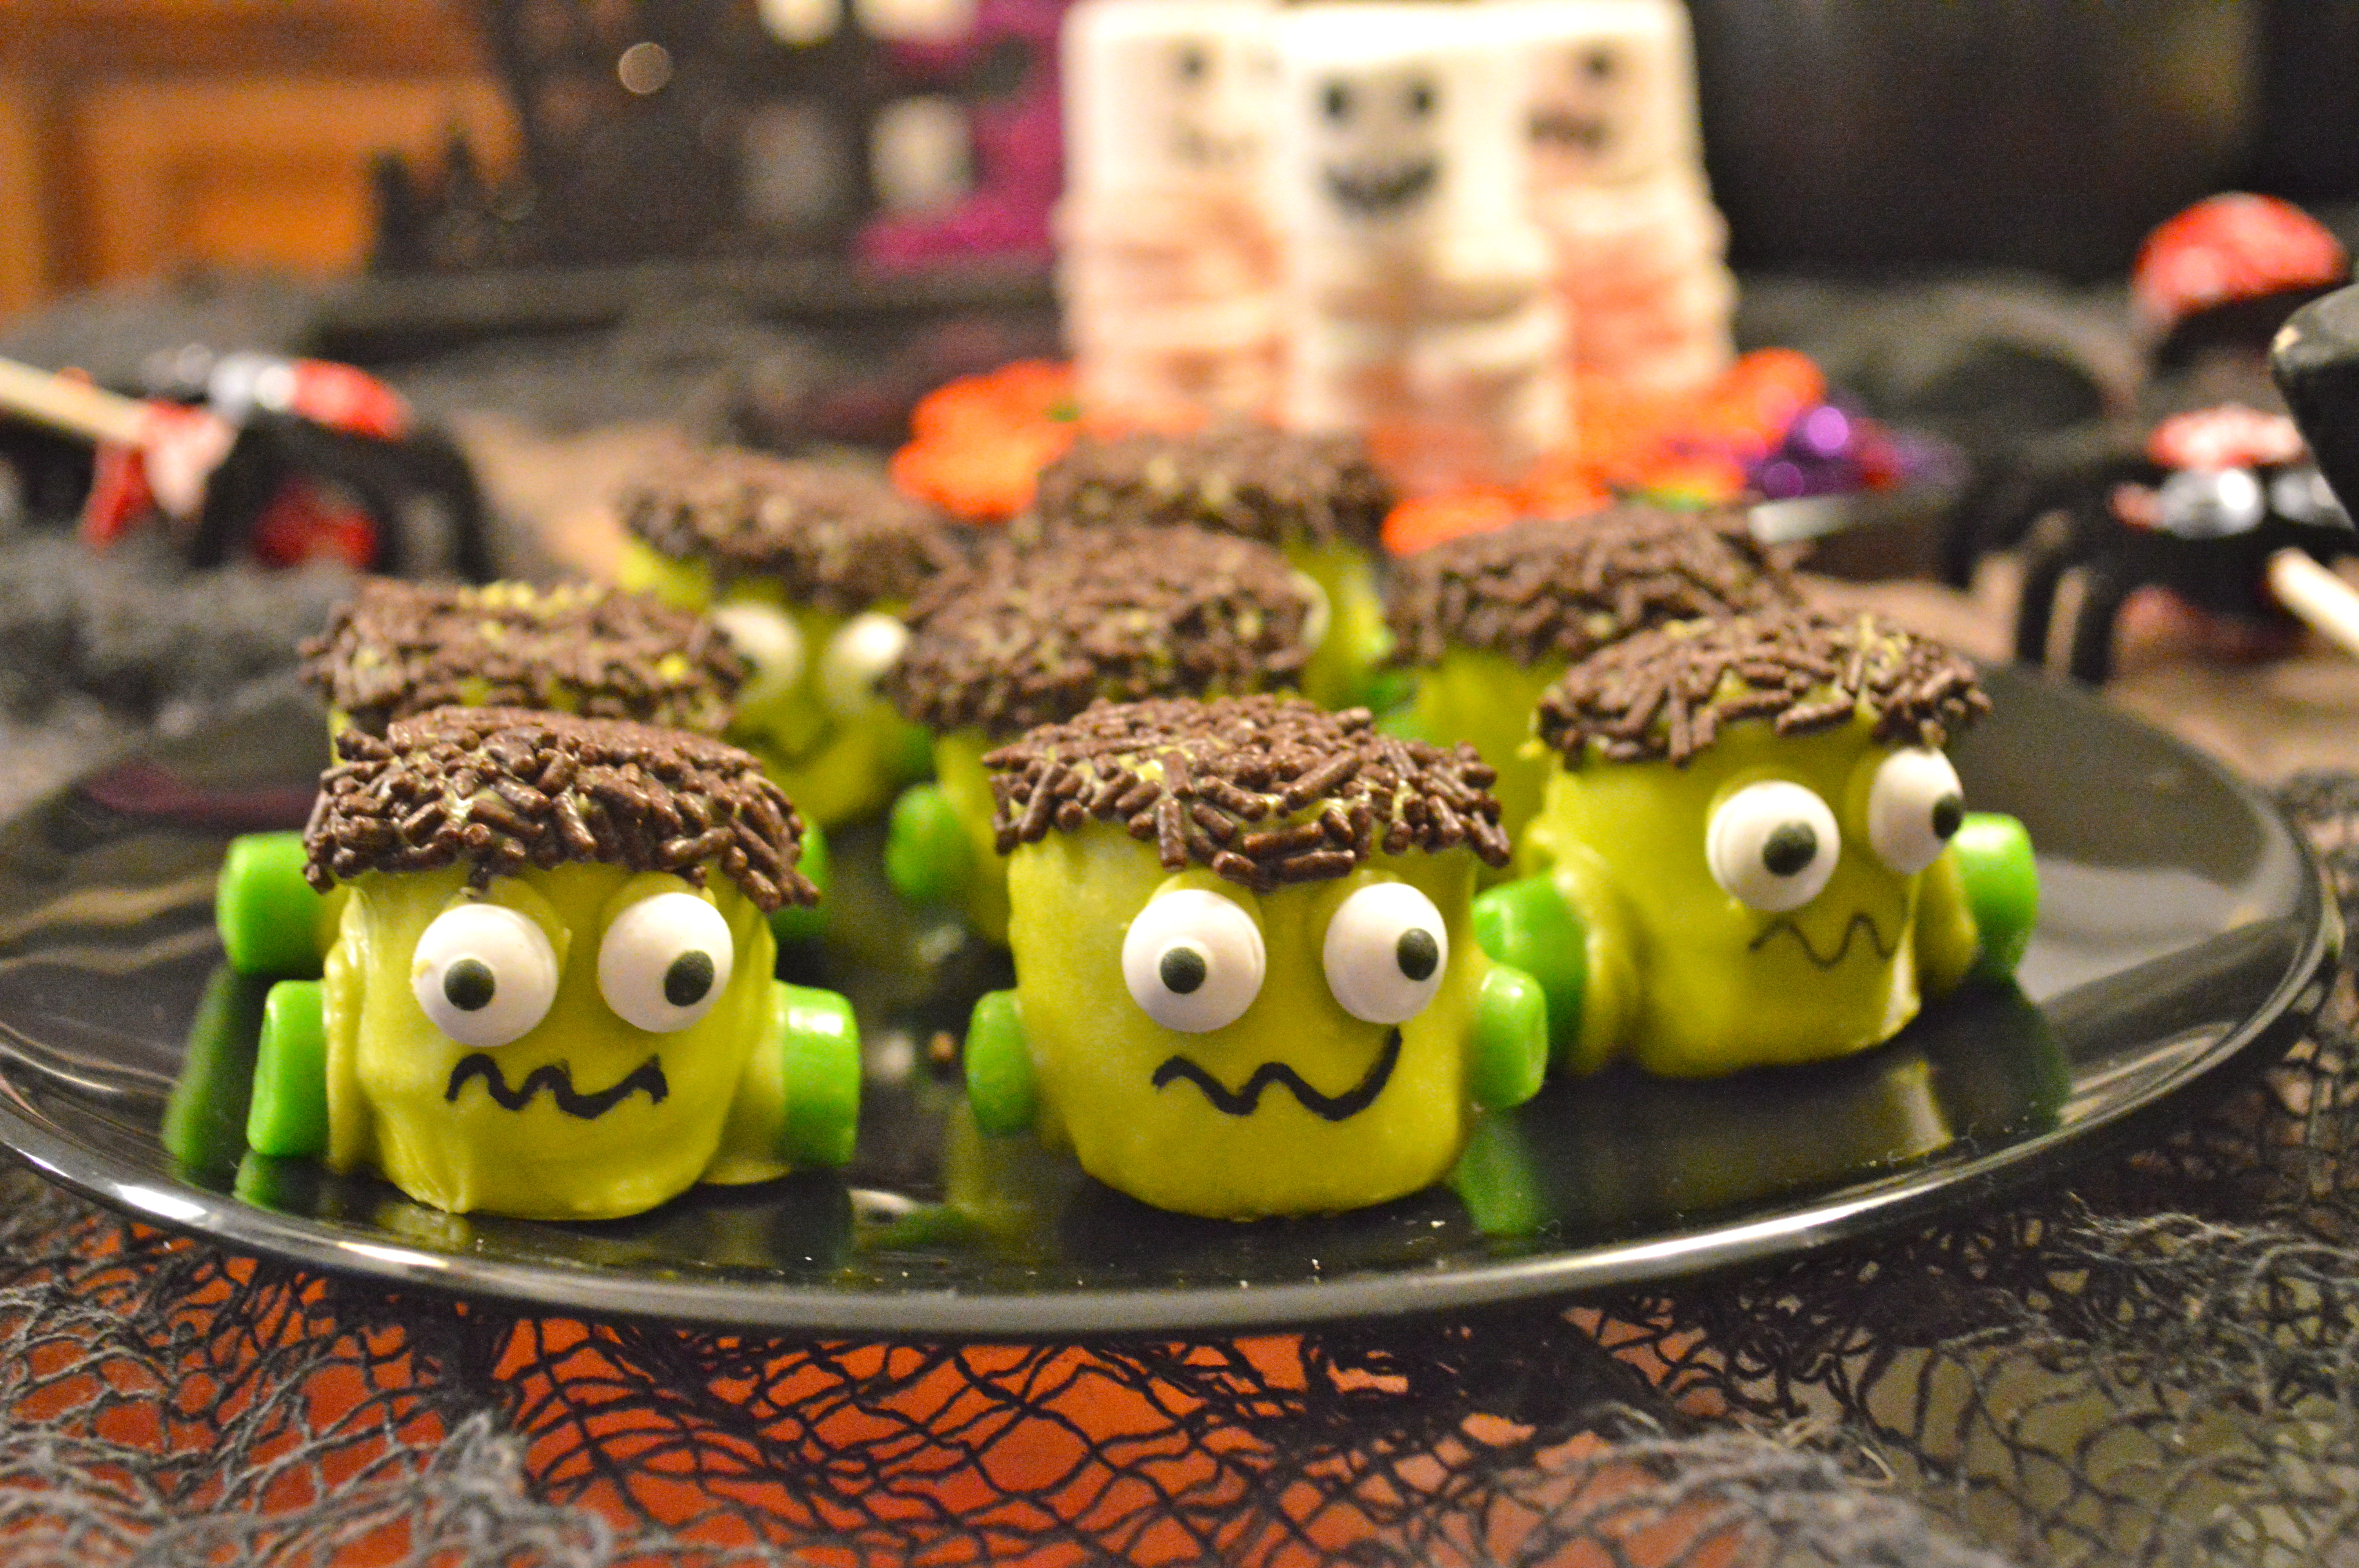 Frankenstein Marshmallow Treats for Halloween - Celebrate & Decorate